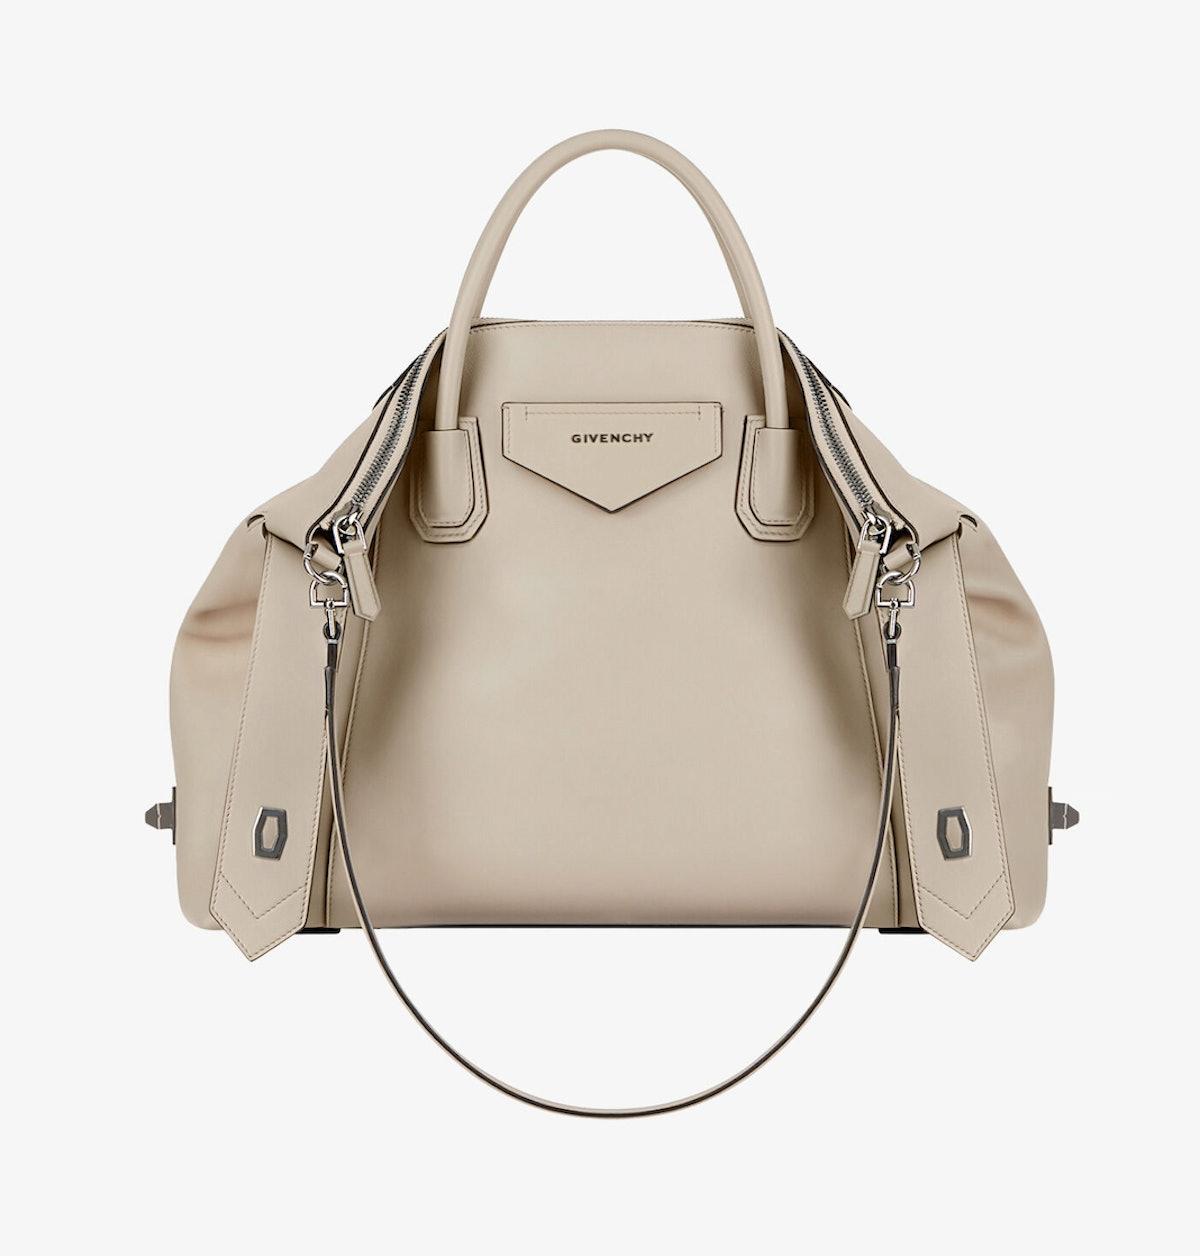 Medium Antigona Soft Bag in Smooth Leather